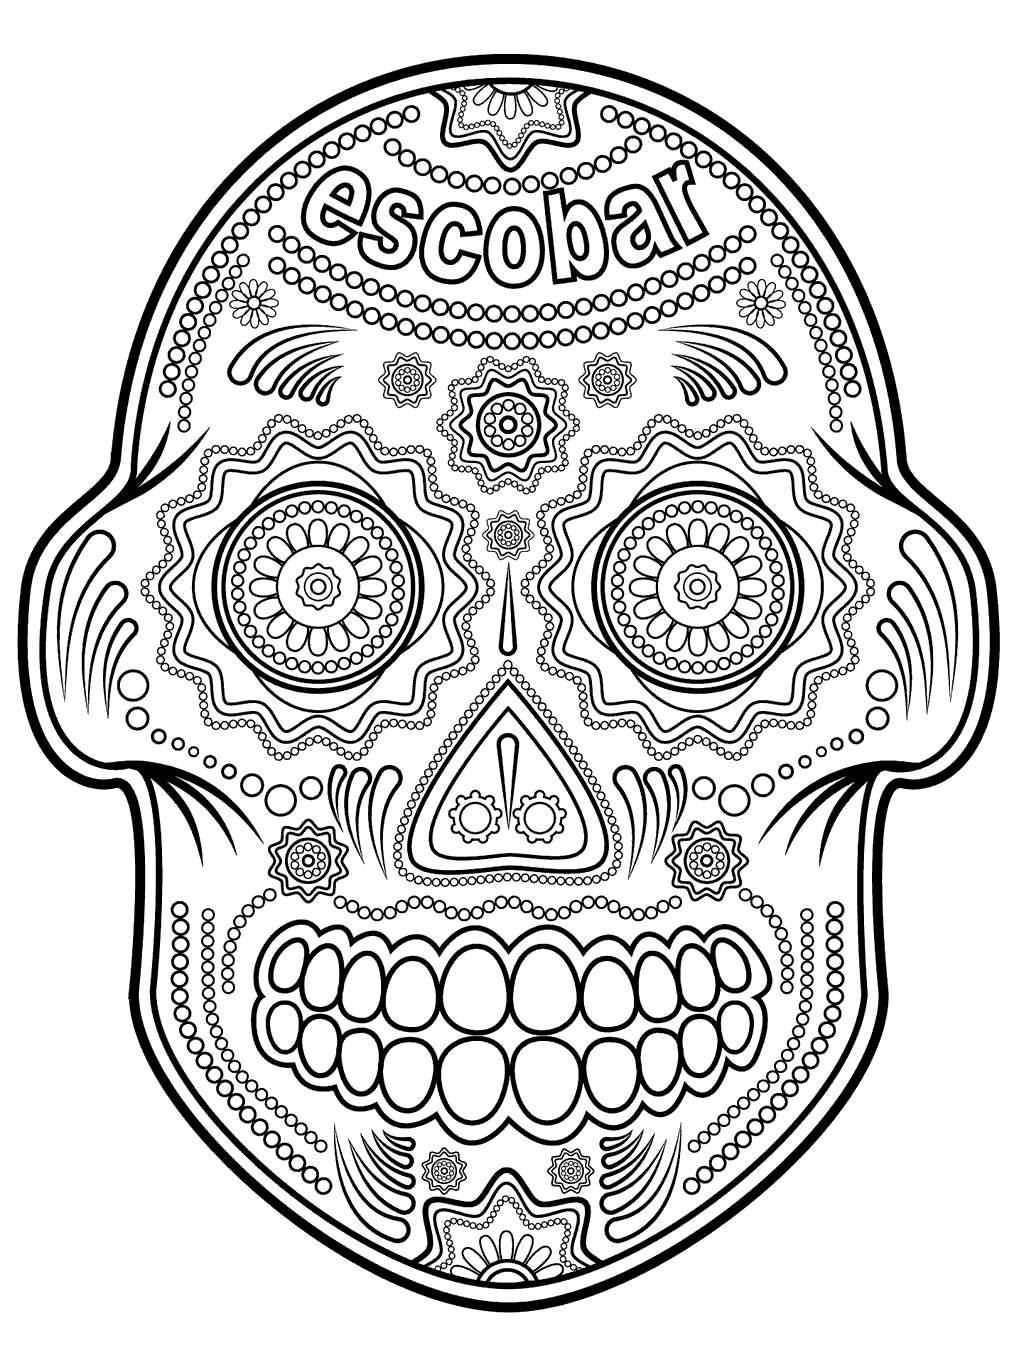 Girl Sugar Skull Coloring Pages Skulls Linear Free Printable